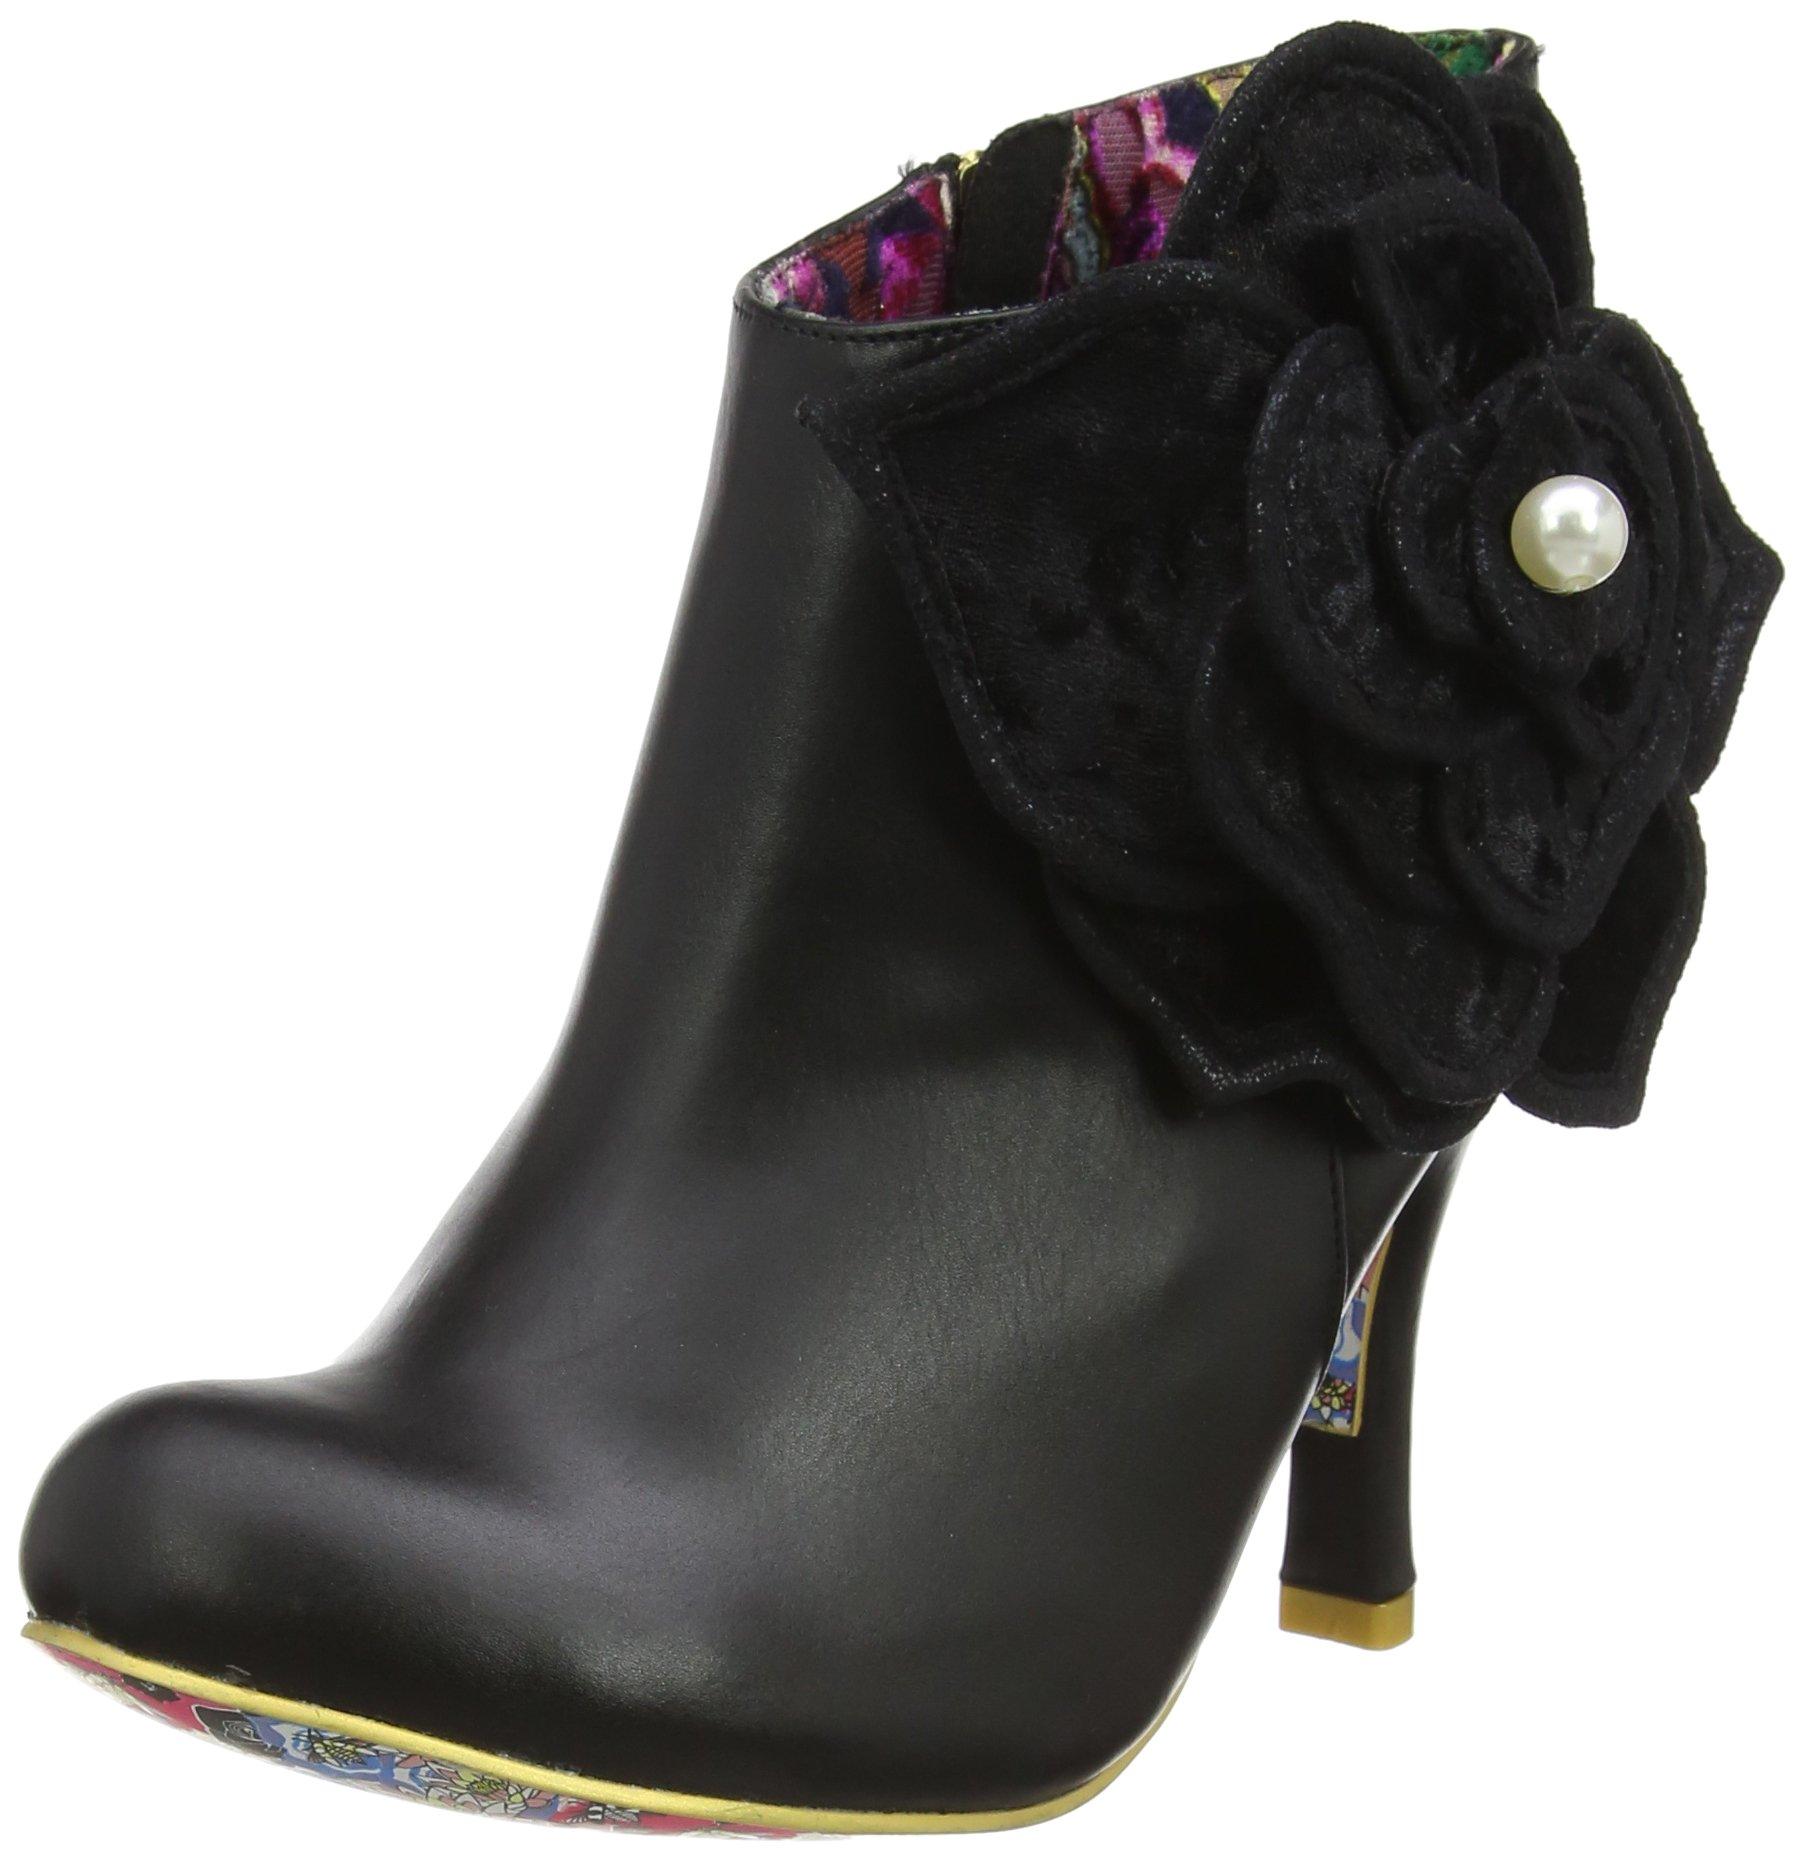 NectureBottes Pearl Choice Irregular Blackblack FemmeNoir New39 Classiques orBedxC